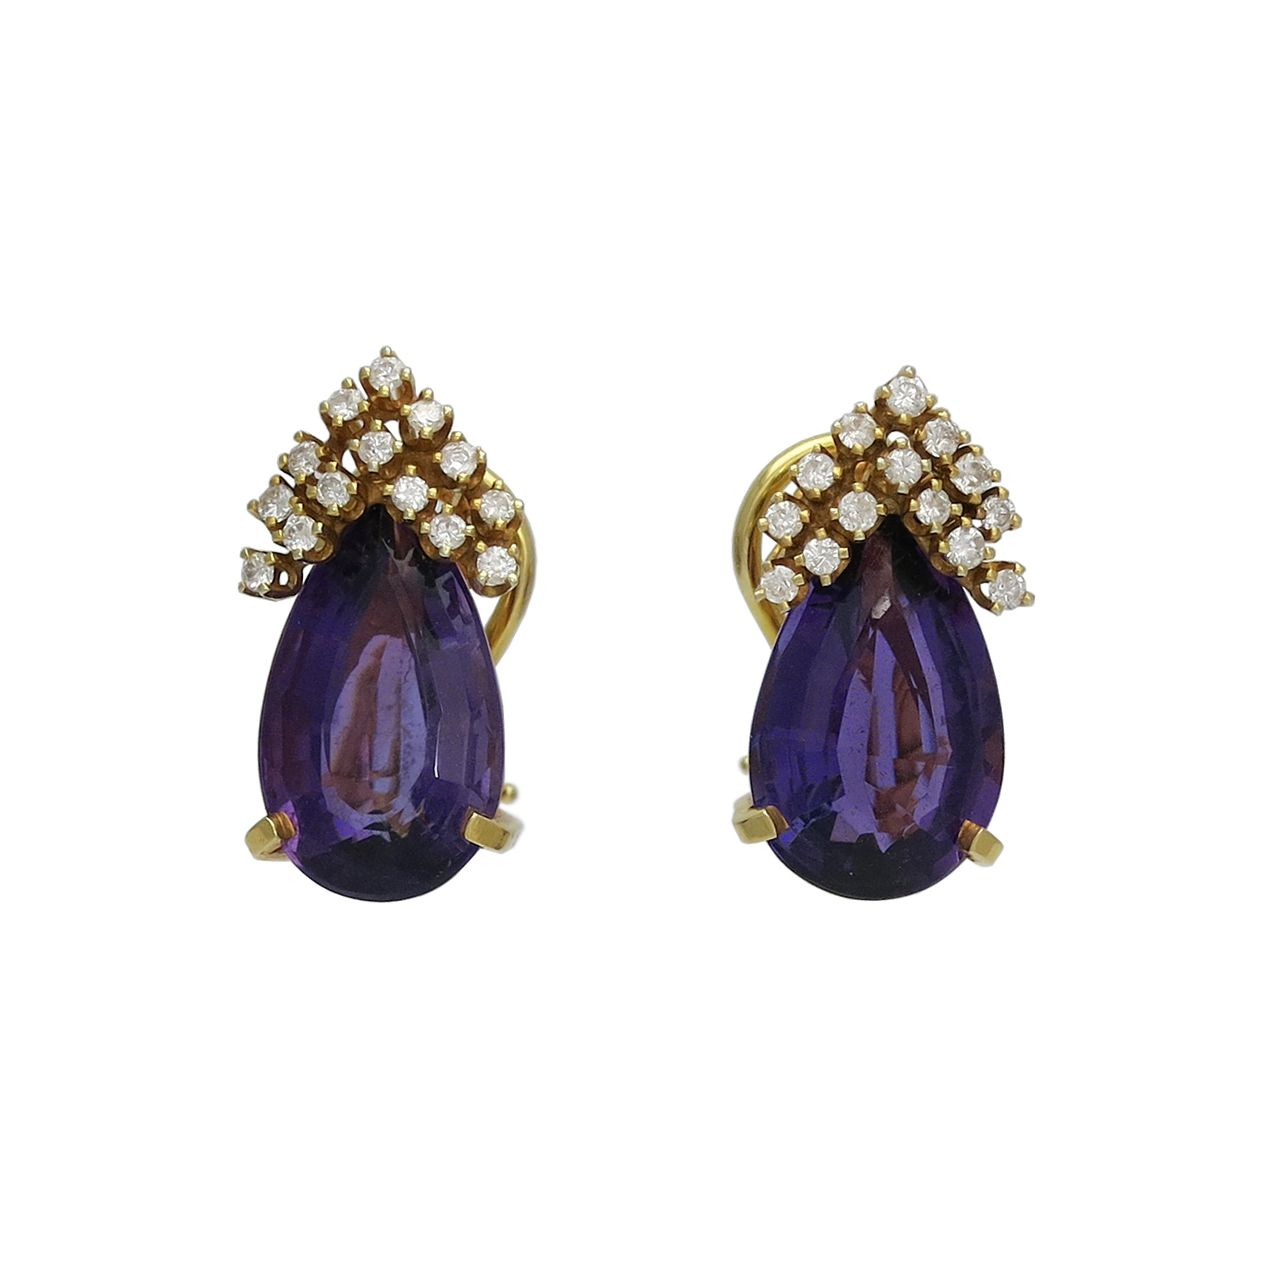 Vintage 14K Gold Amethyst and Diamond Clip Back Earrings, c. 1970s. $1250